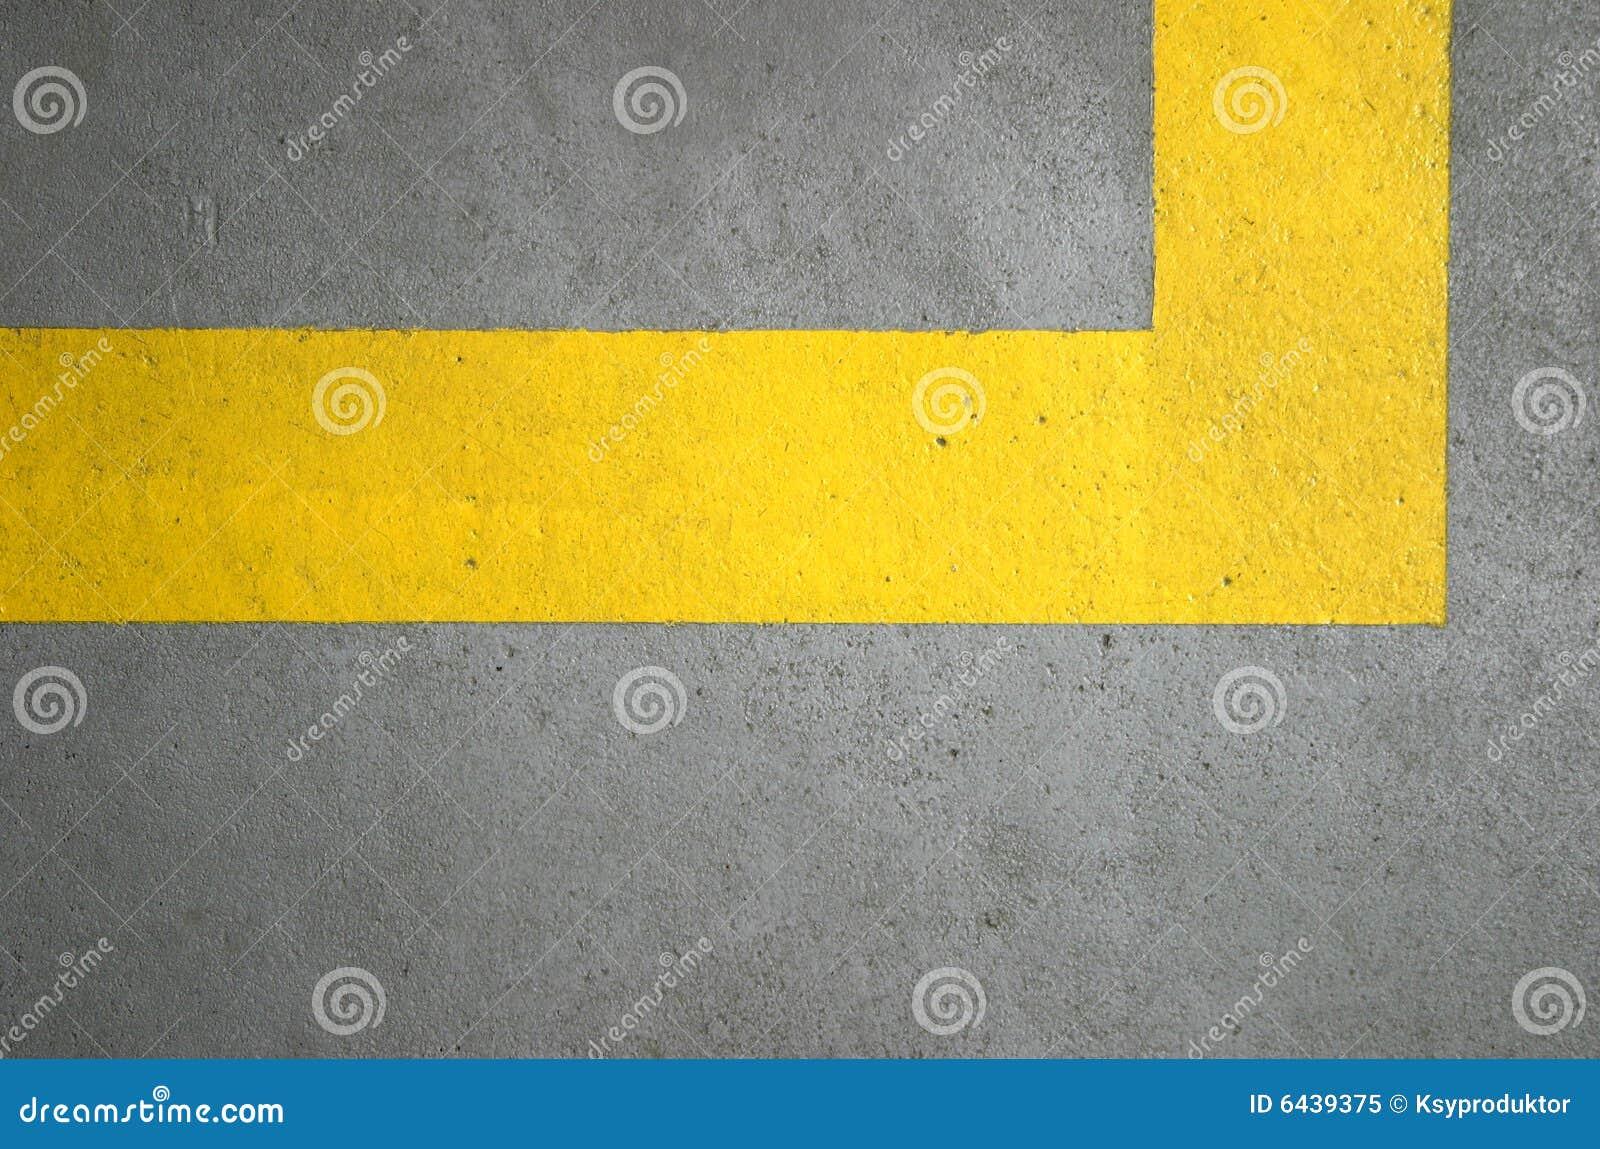 Yellow Lines On Concrete Floor Royalty Free Stock Photo